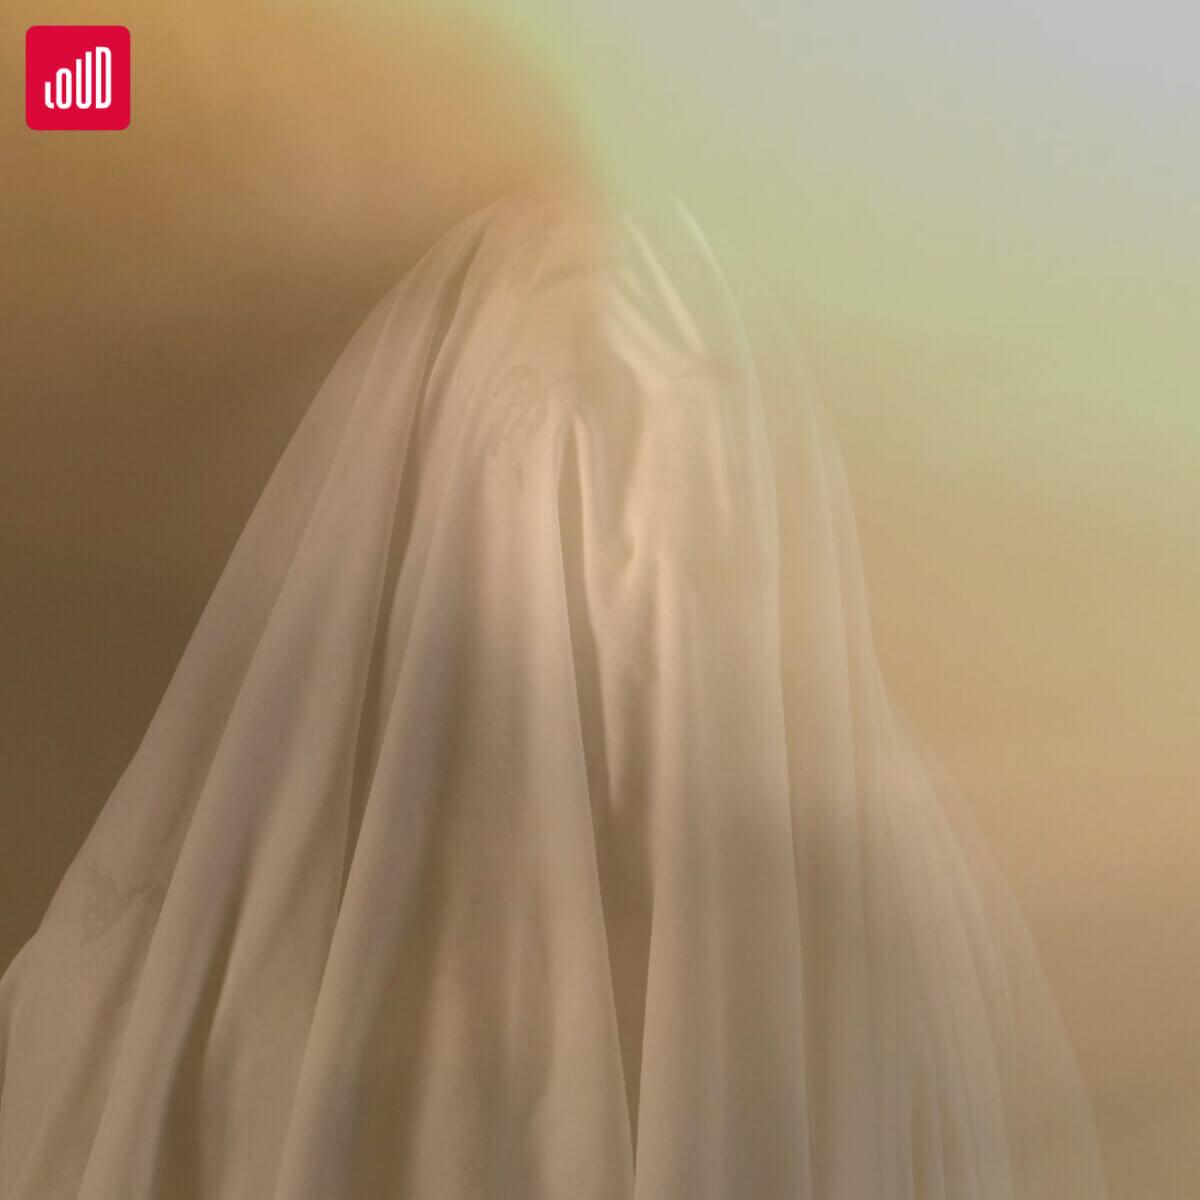 på date med et spøgelse